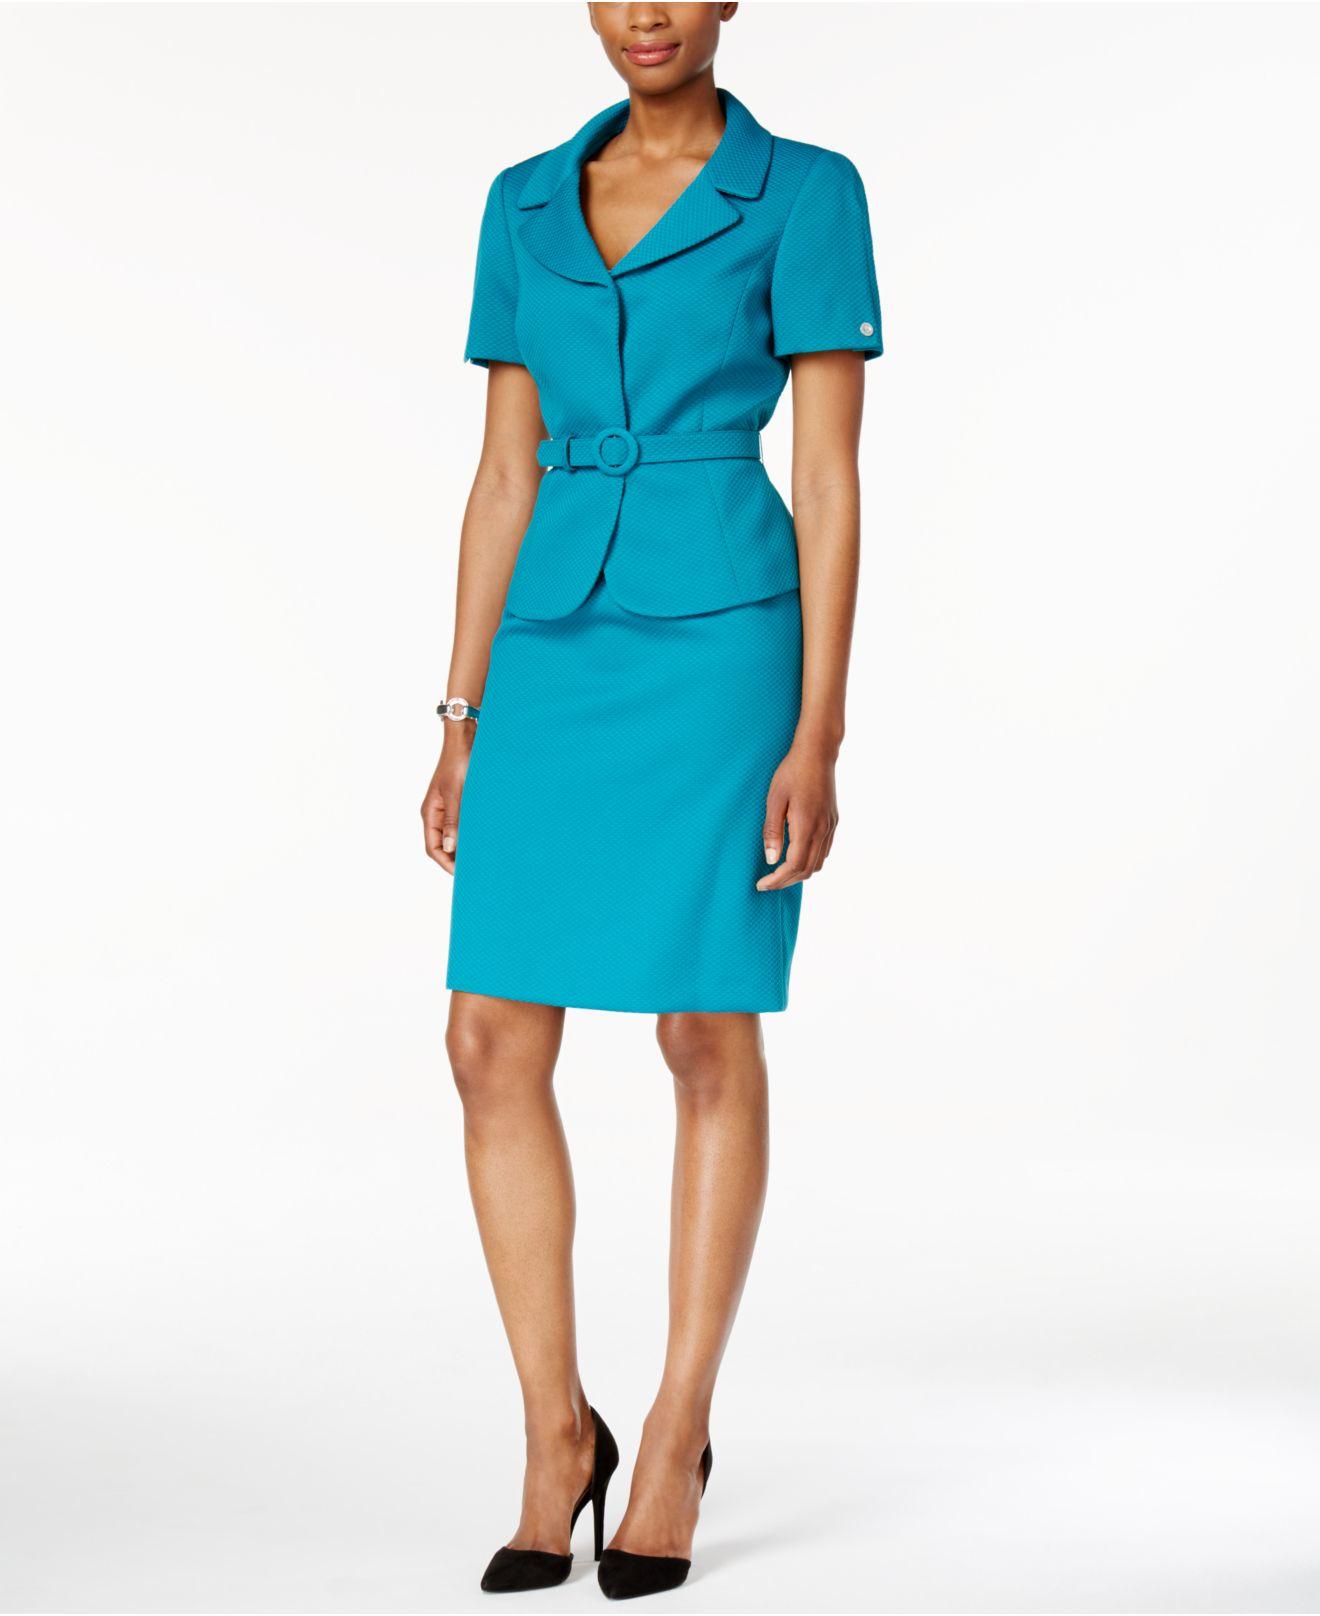 Skirt Suit Short 85